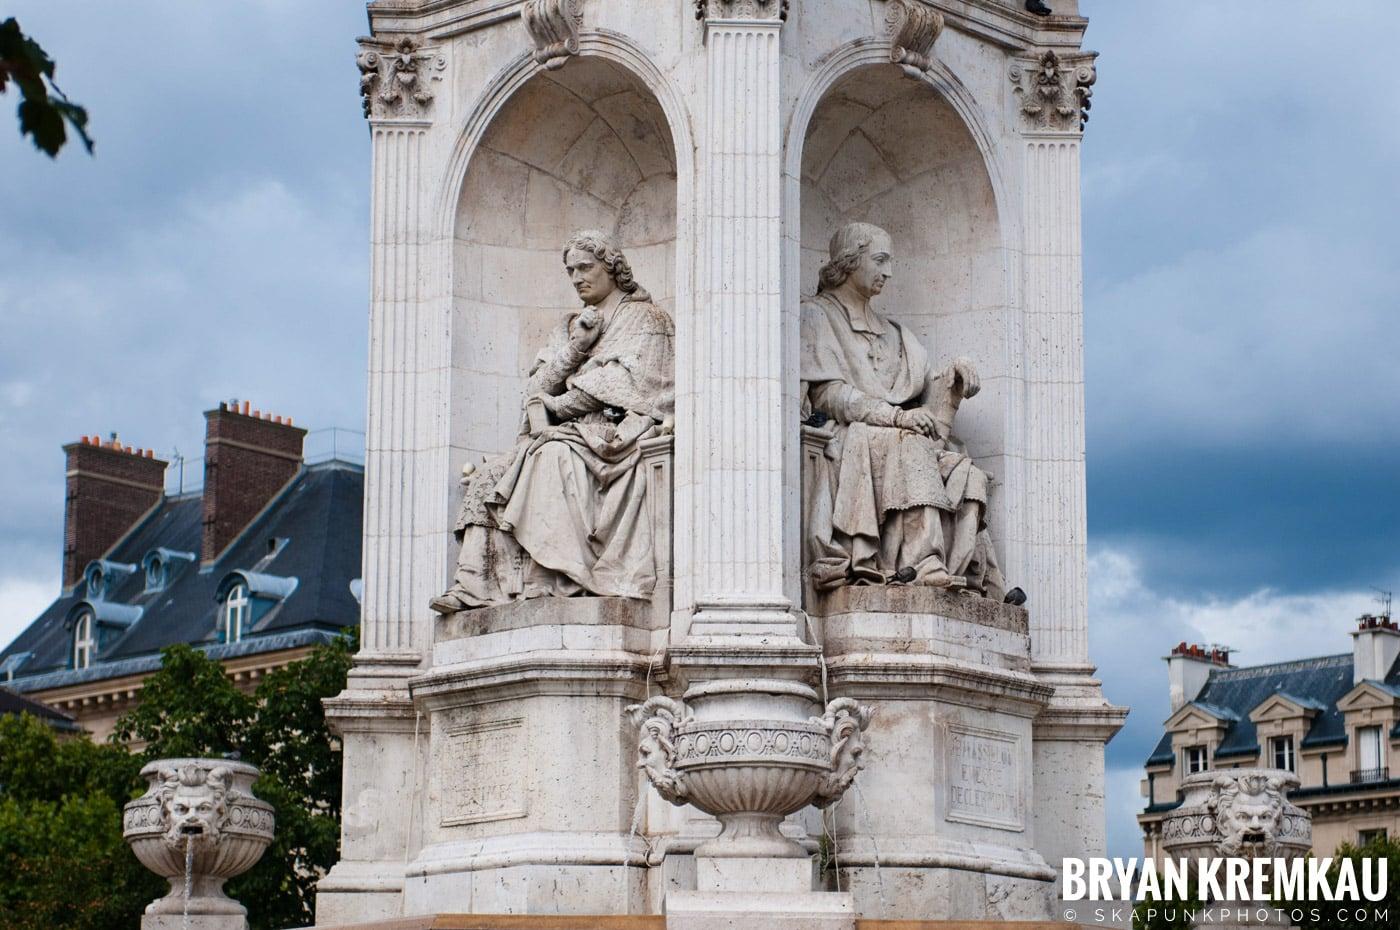 Paris, France Honeymoon - Day 1 - 7.18.11 (27)